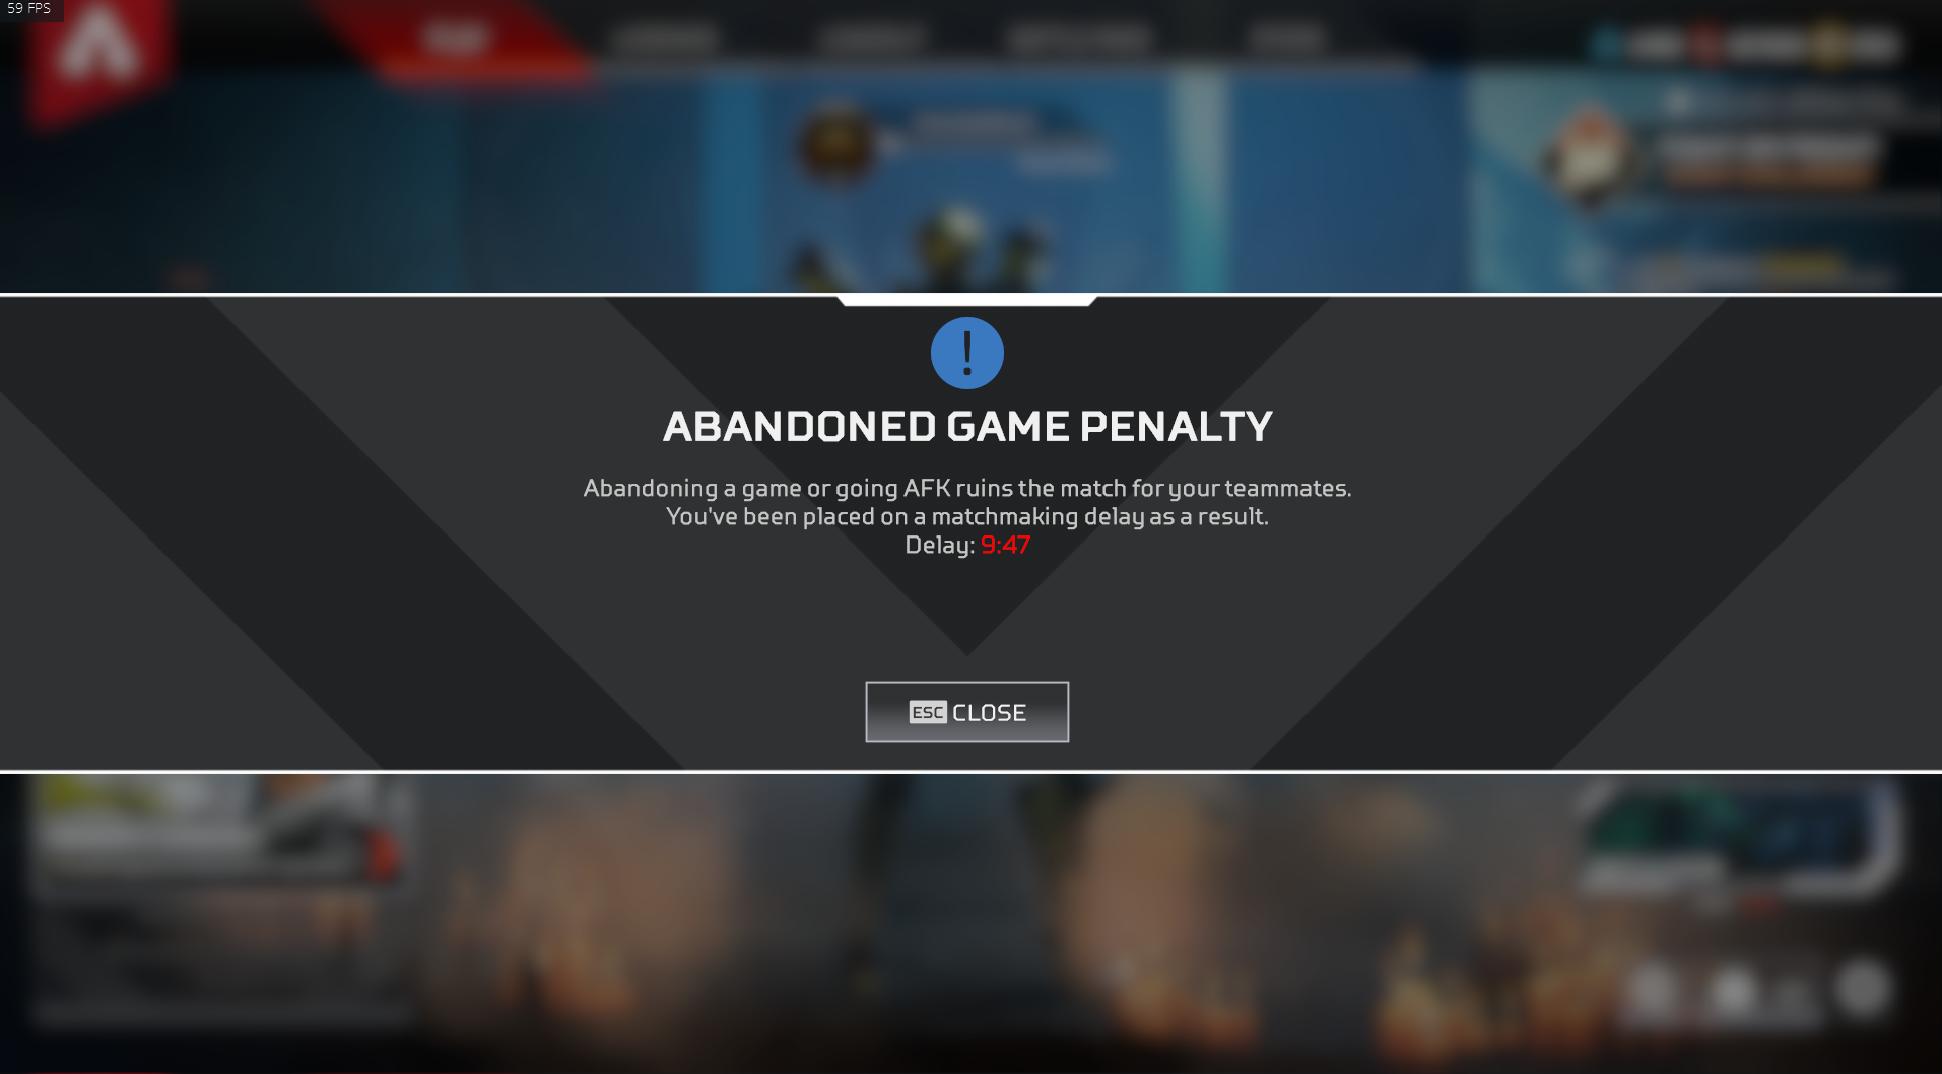 Leave penalty in Apex Legends.